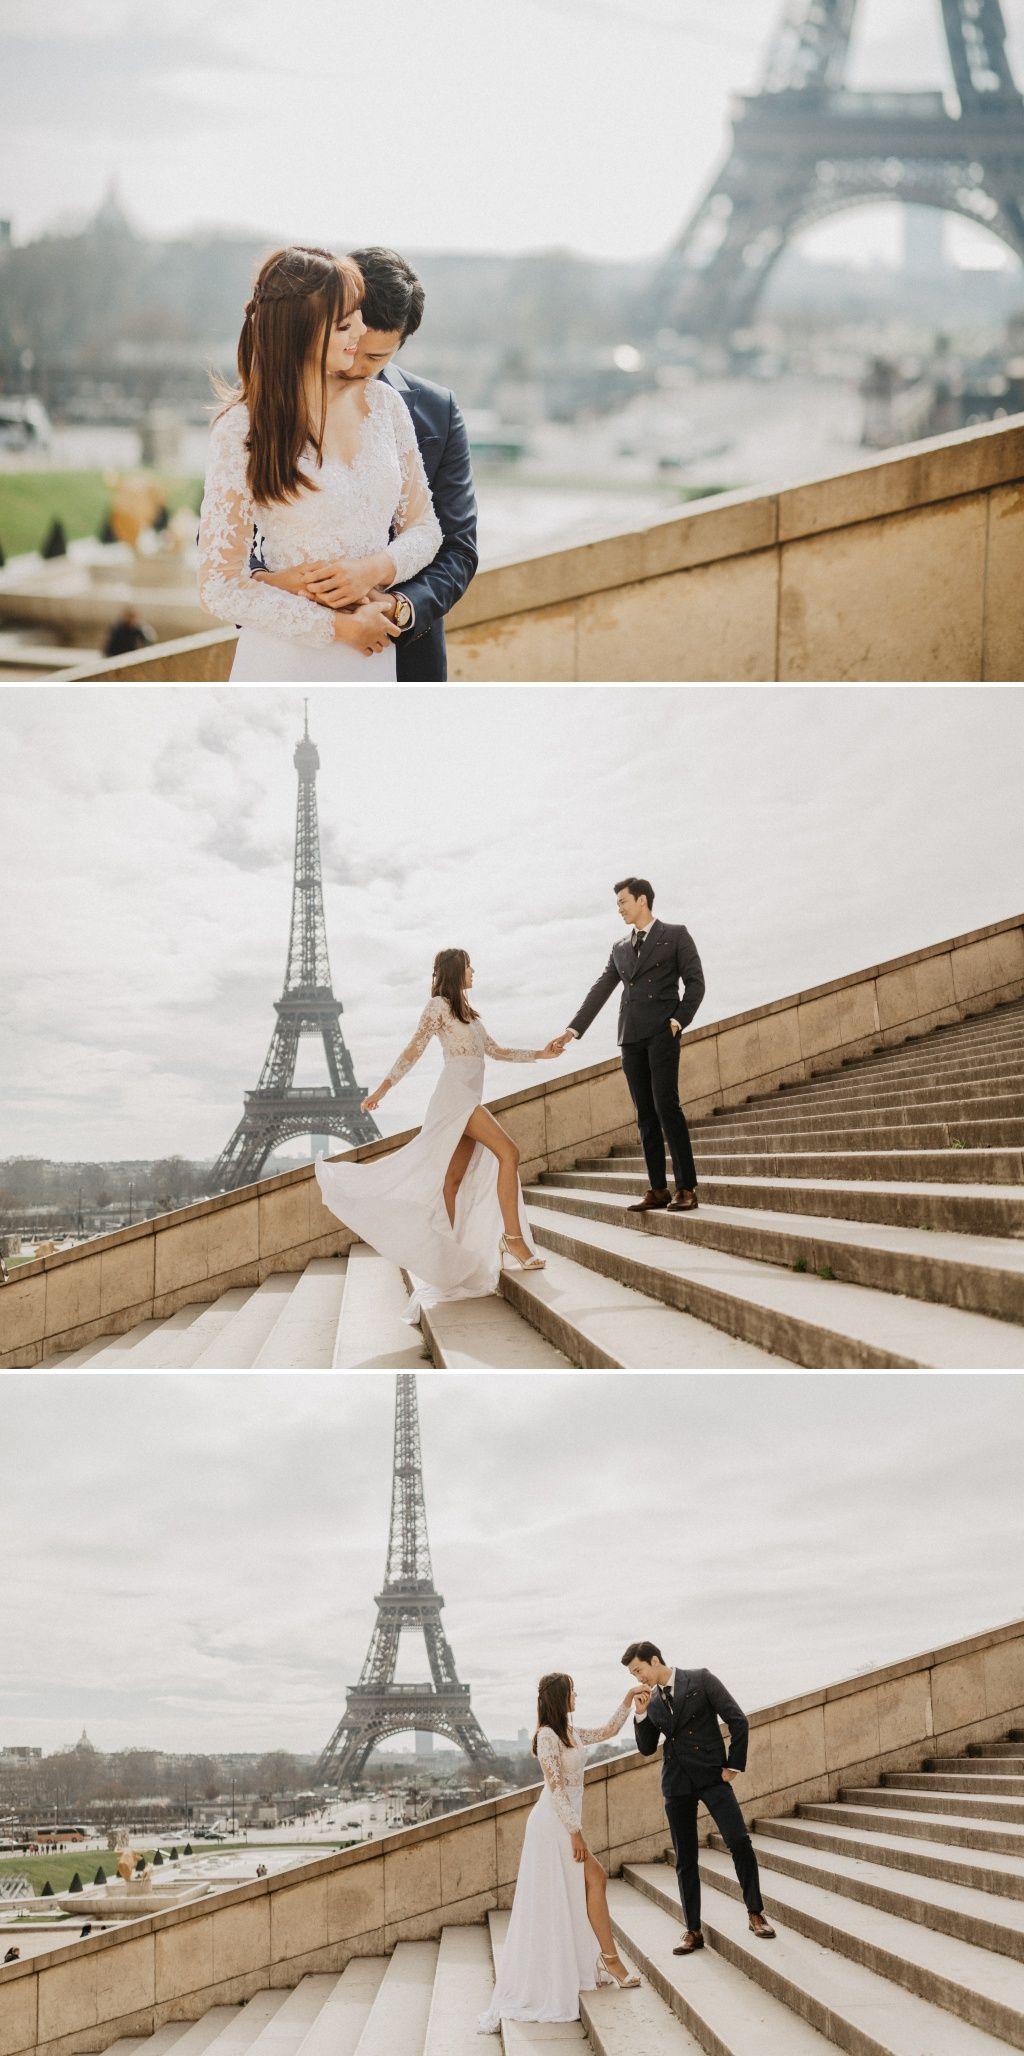 A Casual Contemporary Pre Wedding Shoot In Singapore 004 Prenuptial Photoshoot Couple Photography Poses Pre Wedding Poses